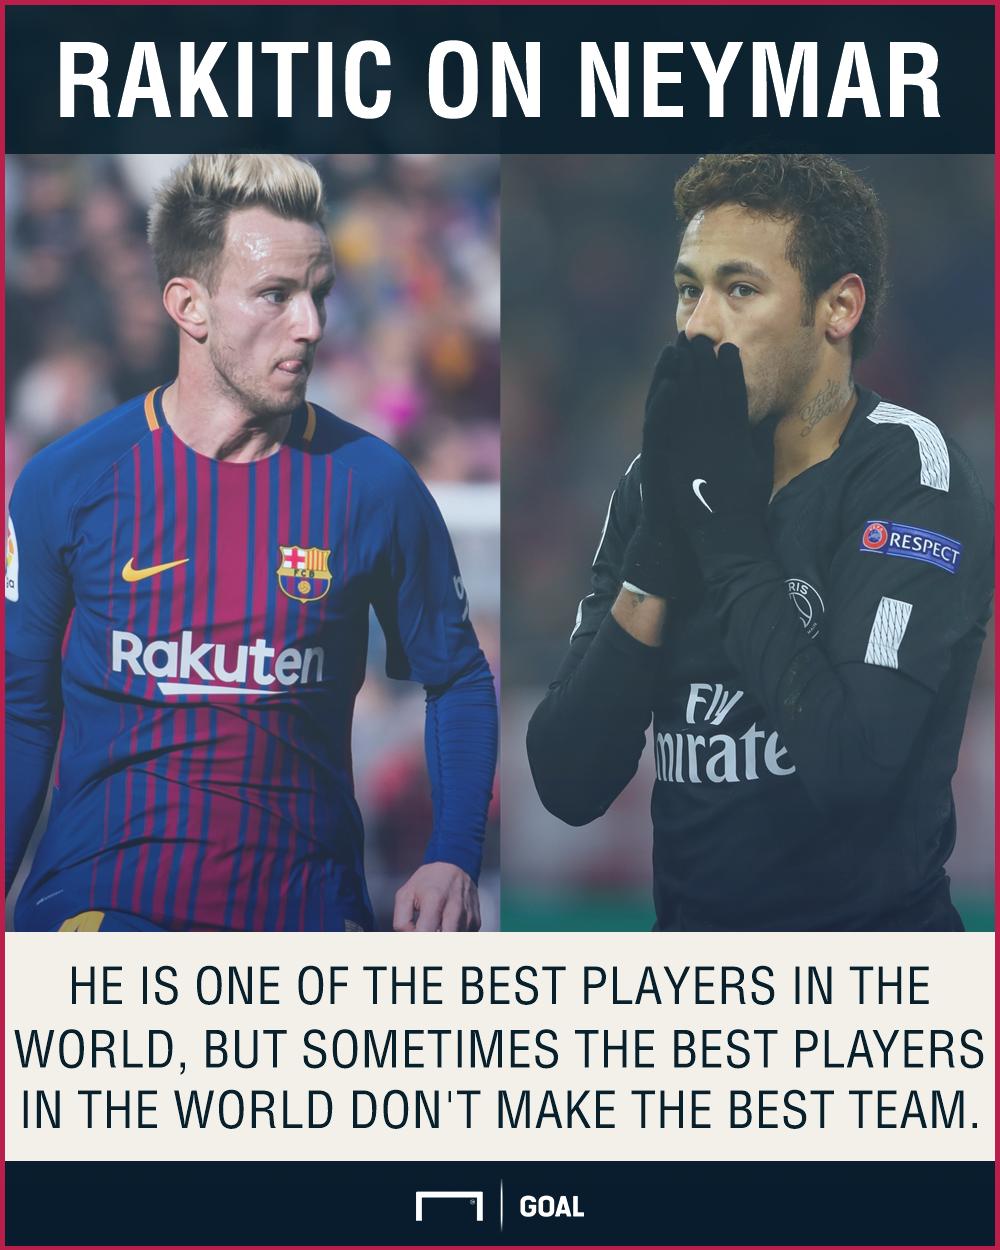 Ivan Rakitic Neymar best players not best team